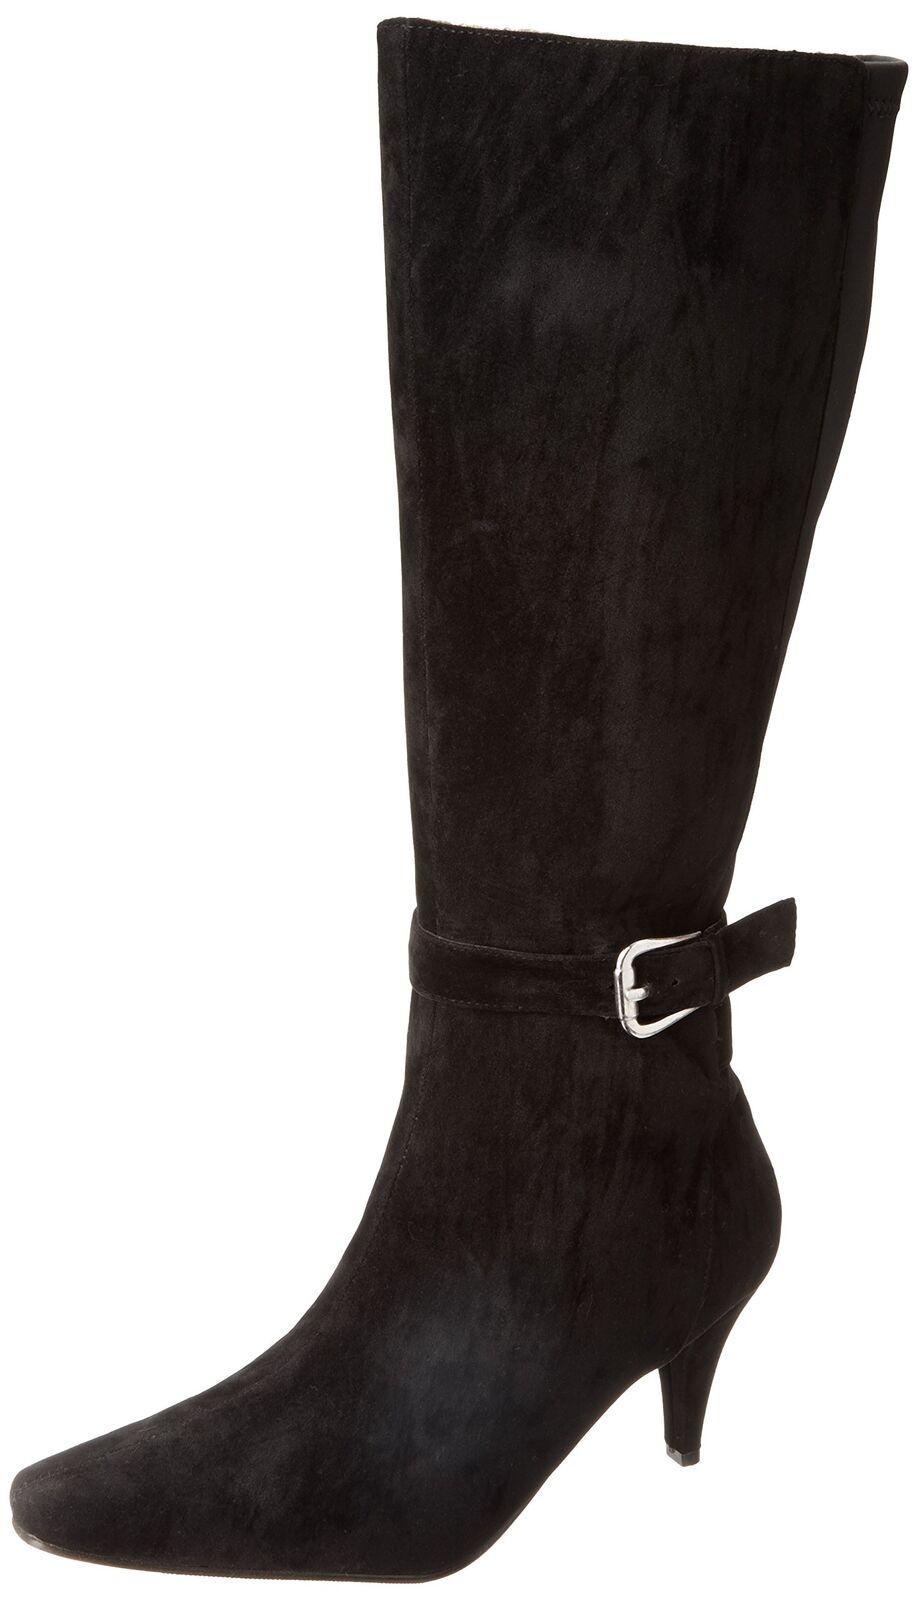 Annie zapatos para mujer Valetta Bota Negro Terciopelo Gamuza negro STRETCH nos 7 C